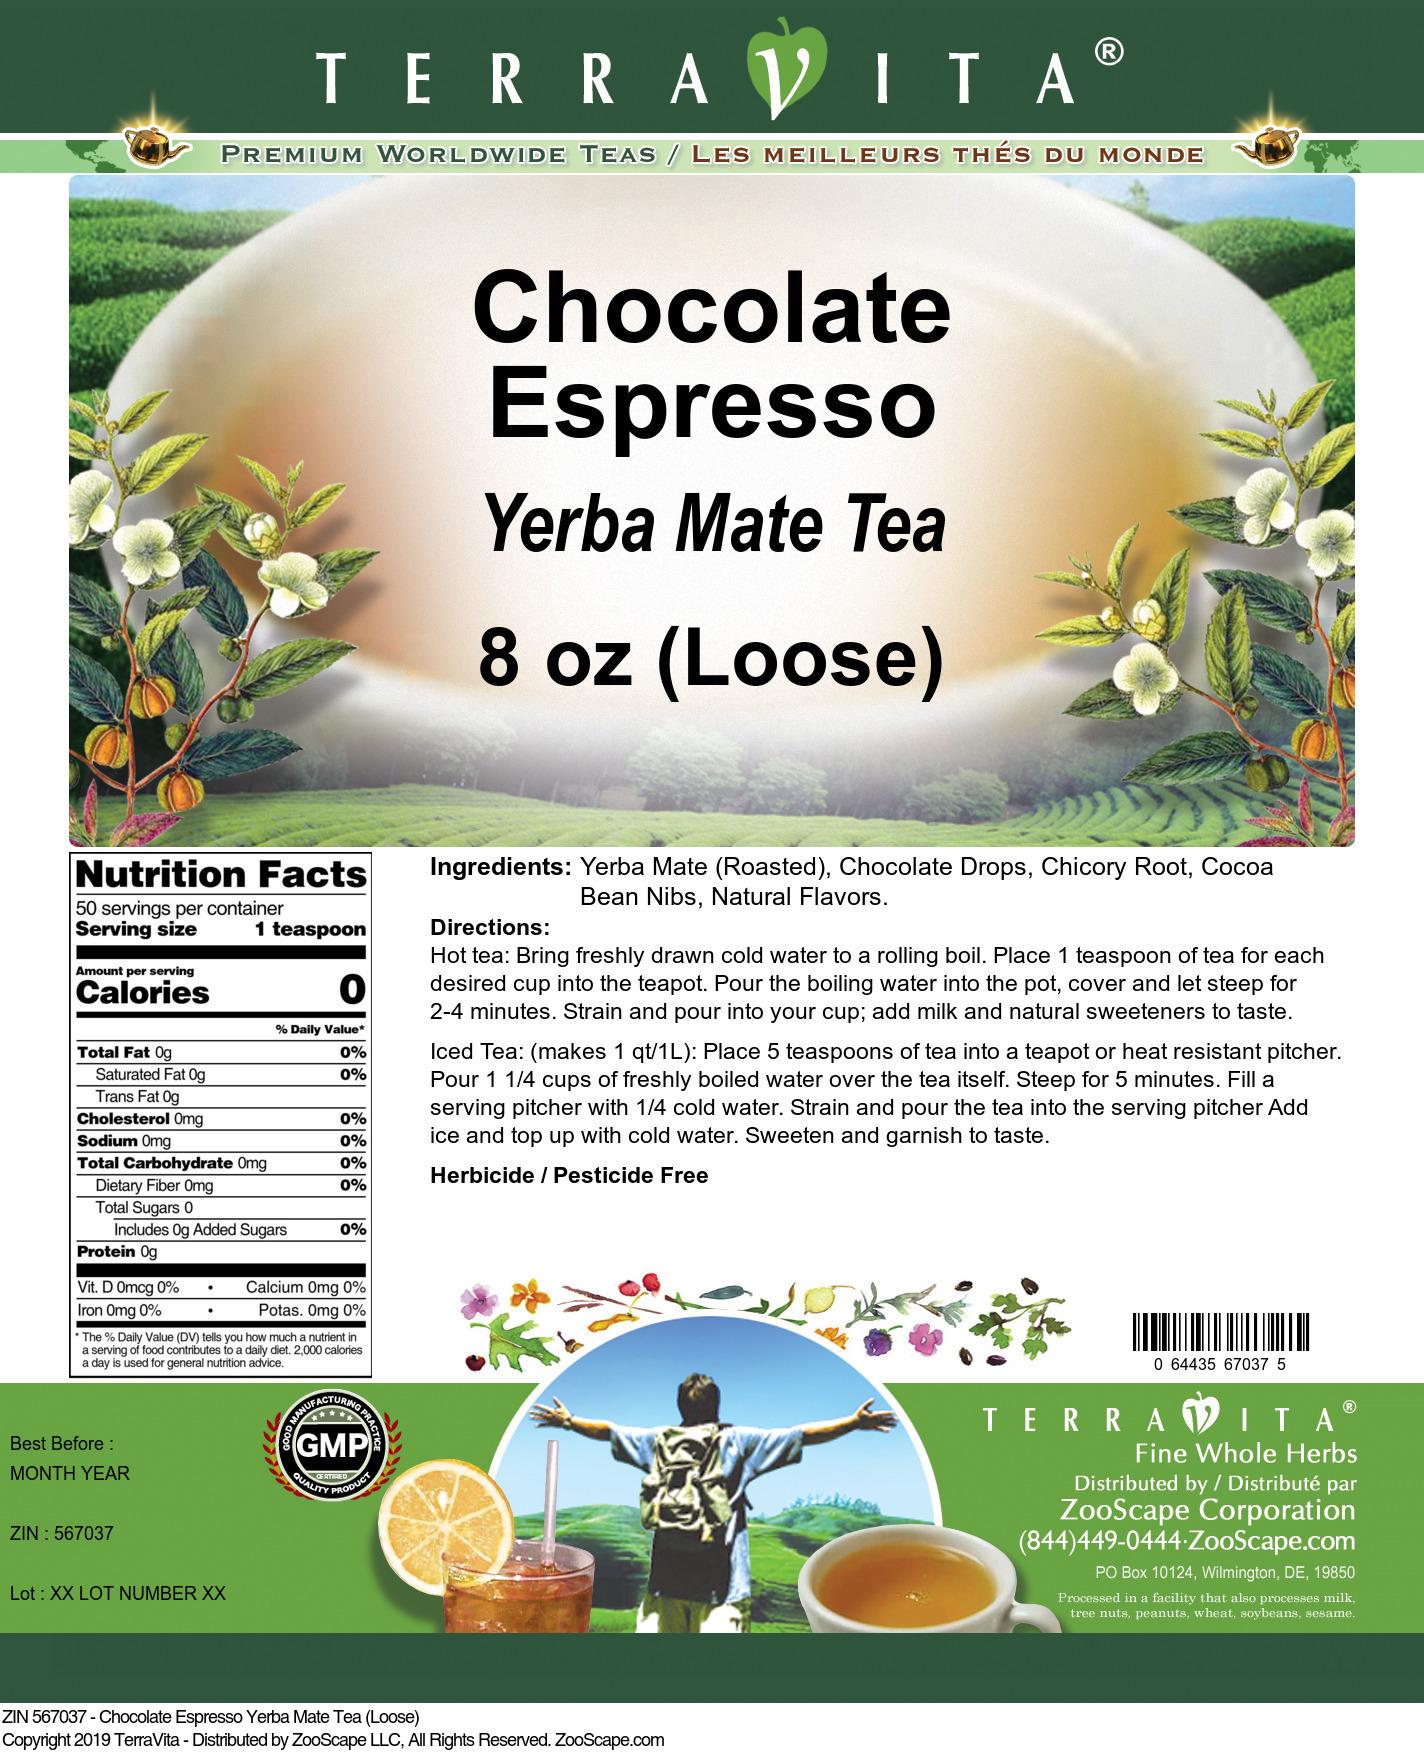 Chocolate Espresso Yerba Mate